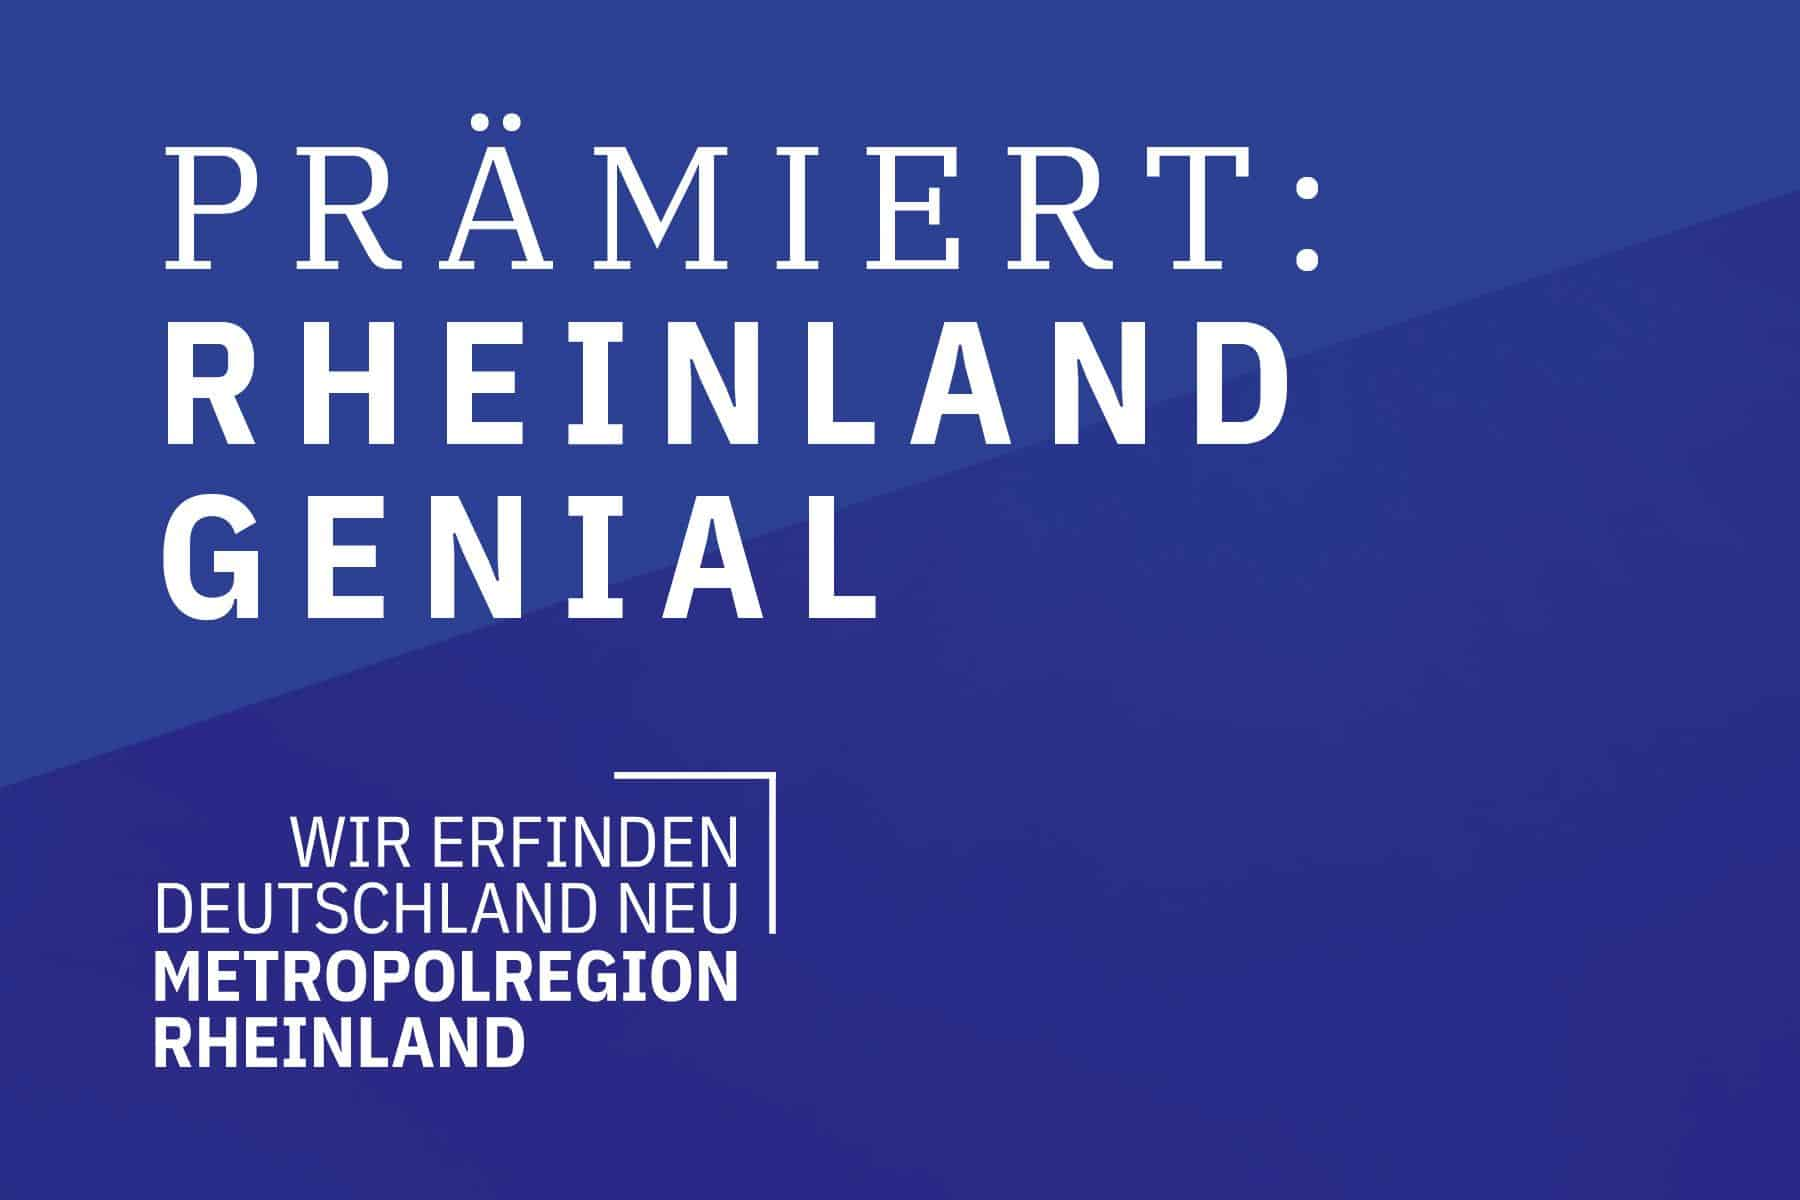 Award Rheinland Genial Websitebanner 1800 x 1200